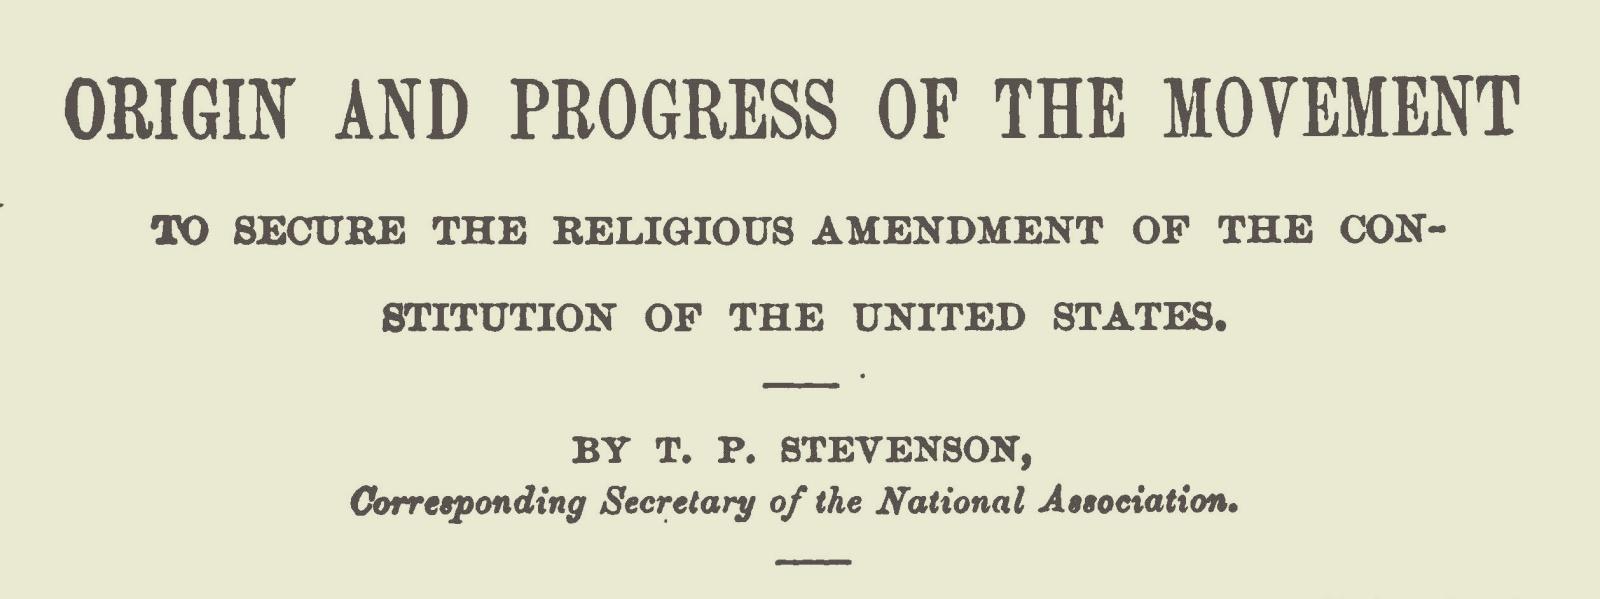 Stevenson, Thomas Patton, Origin and Progress of the Movement Title Page.jpg